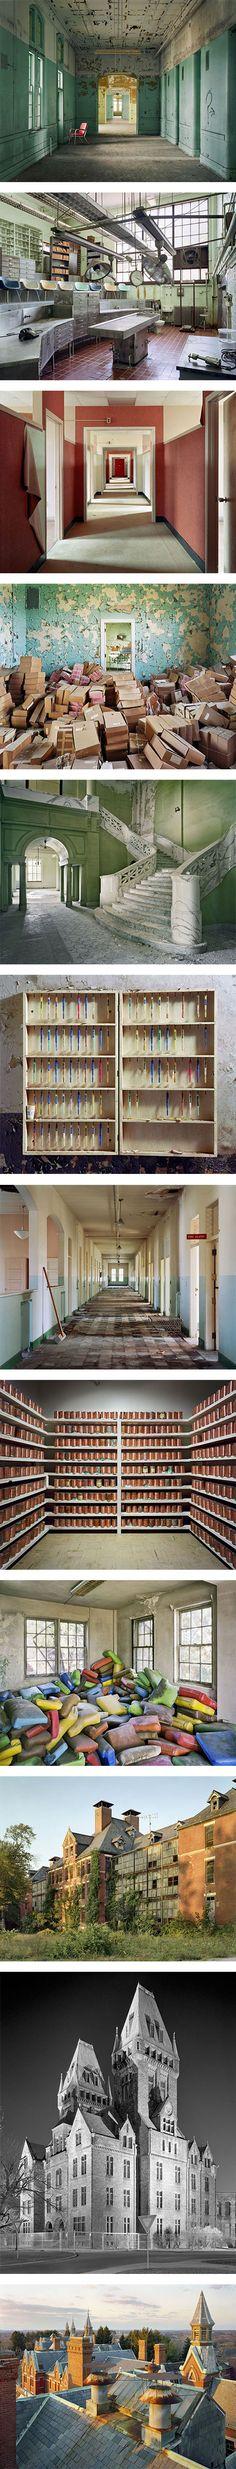 Asylum: Inside the world of abandoned psychiatric hospitals on Nuji.com #photography #abandonedhospitals #christopherpayne